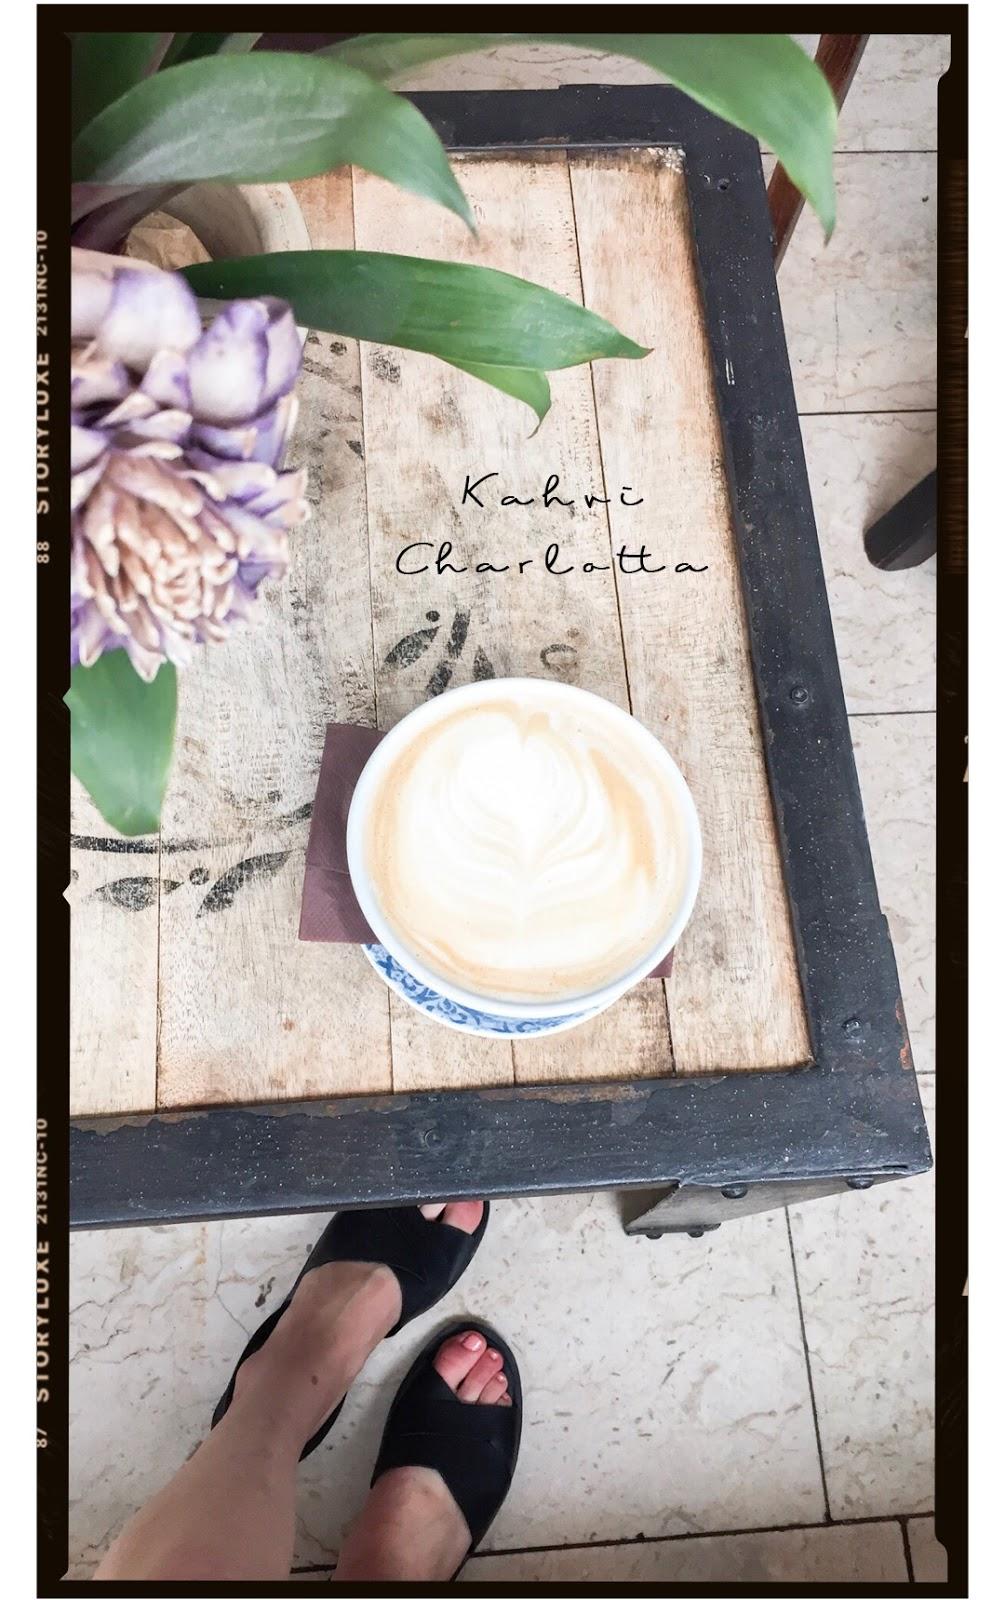 Coffee shops in Helsinki // Kahvilat Helsingissä: Kahvi Charlotta